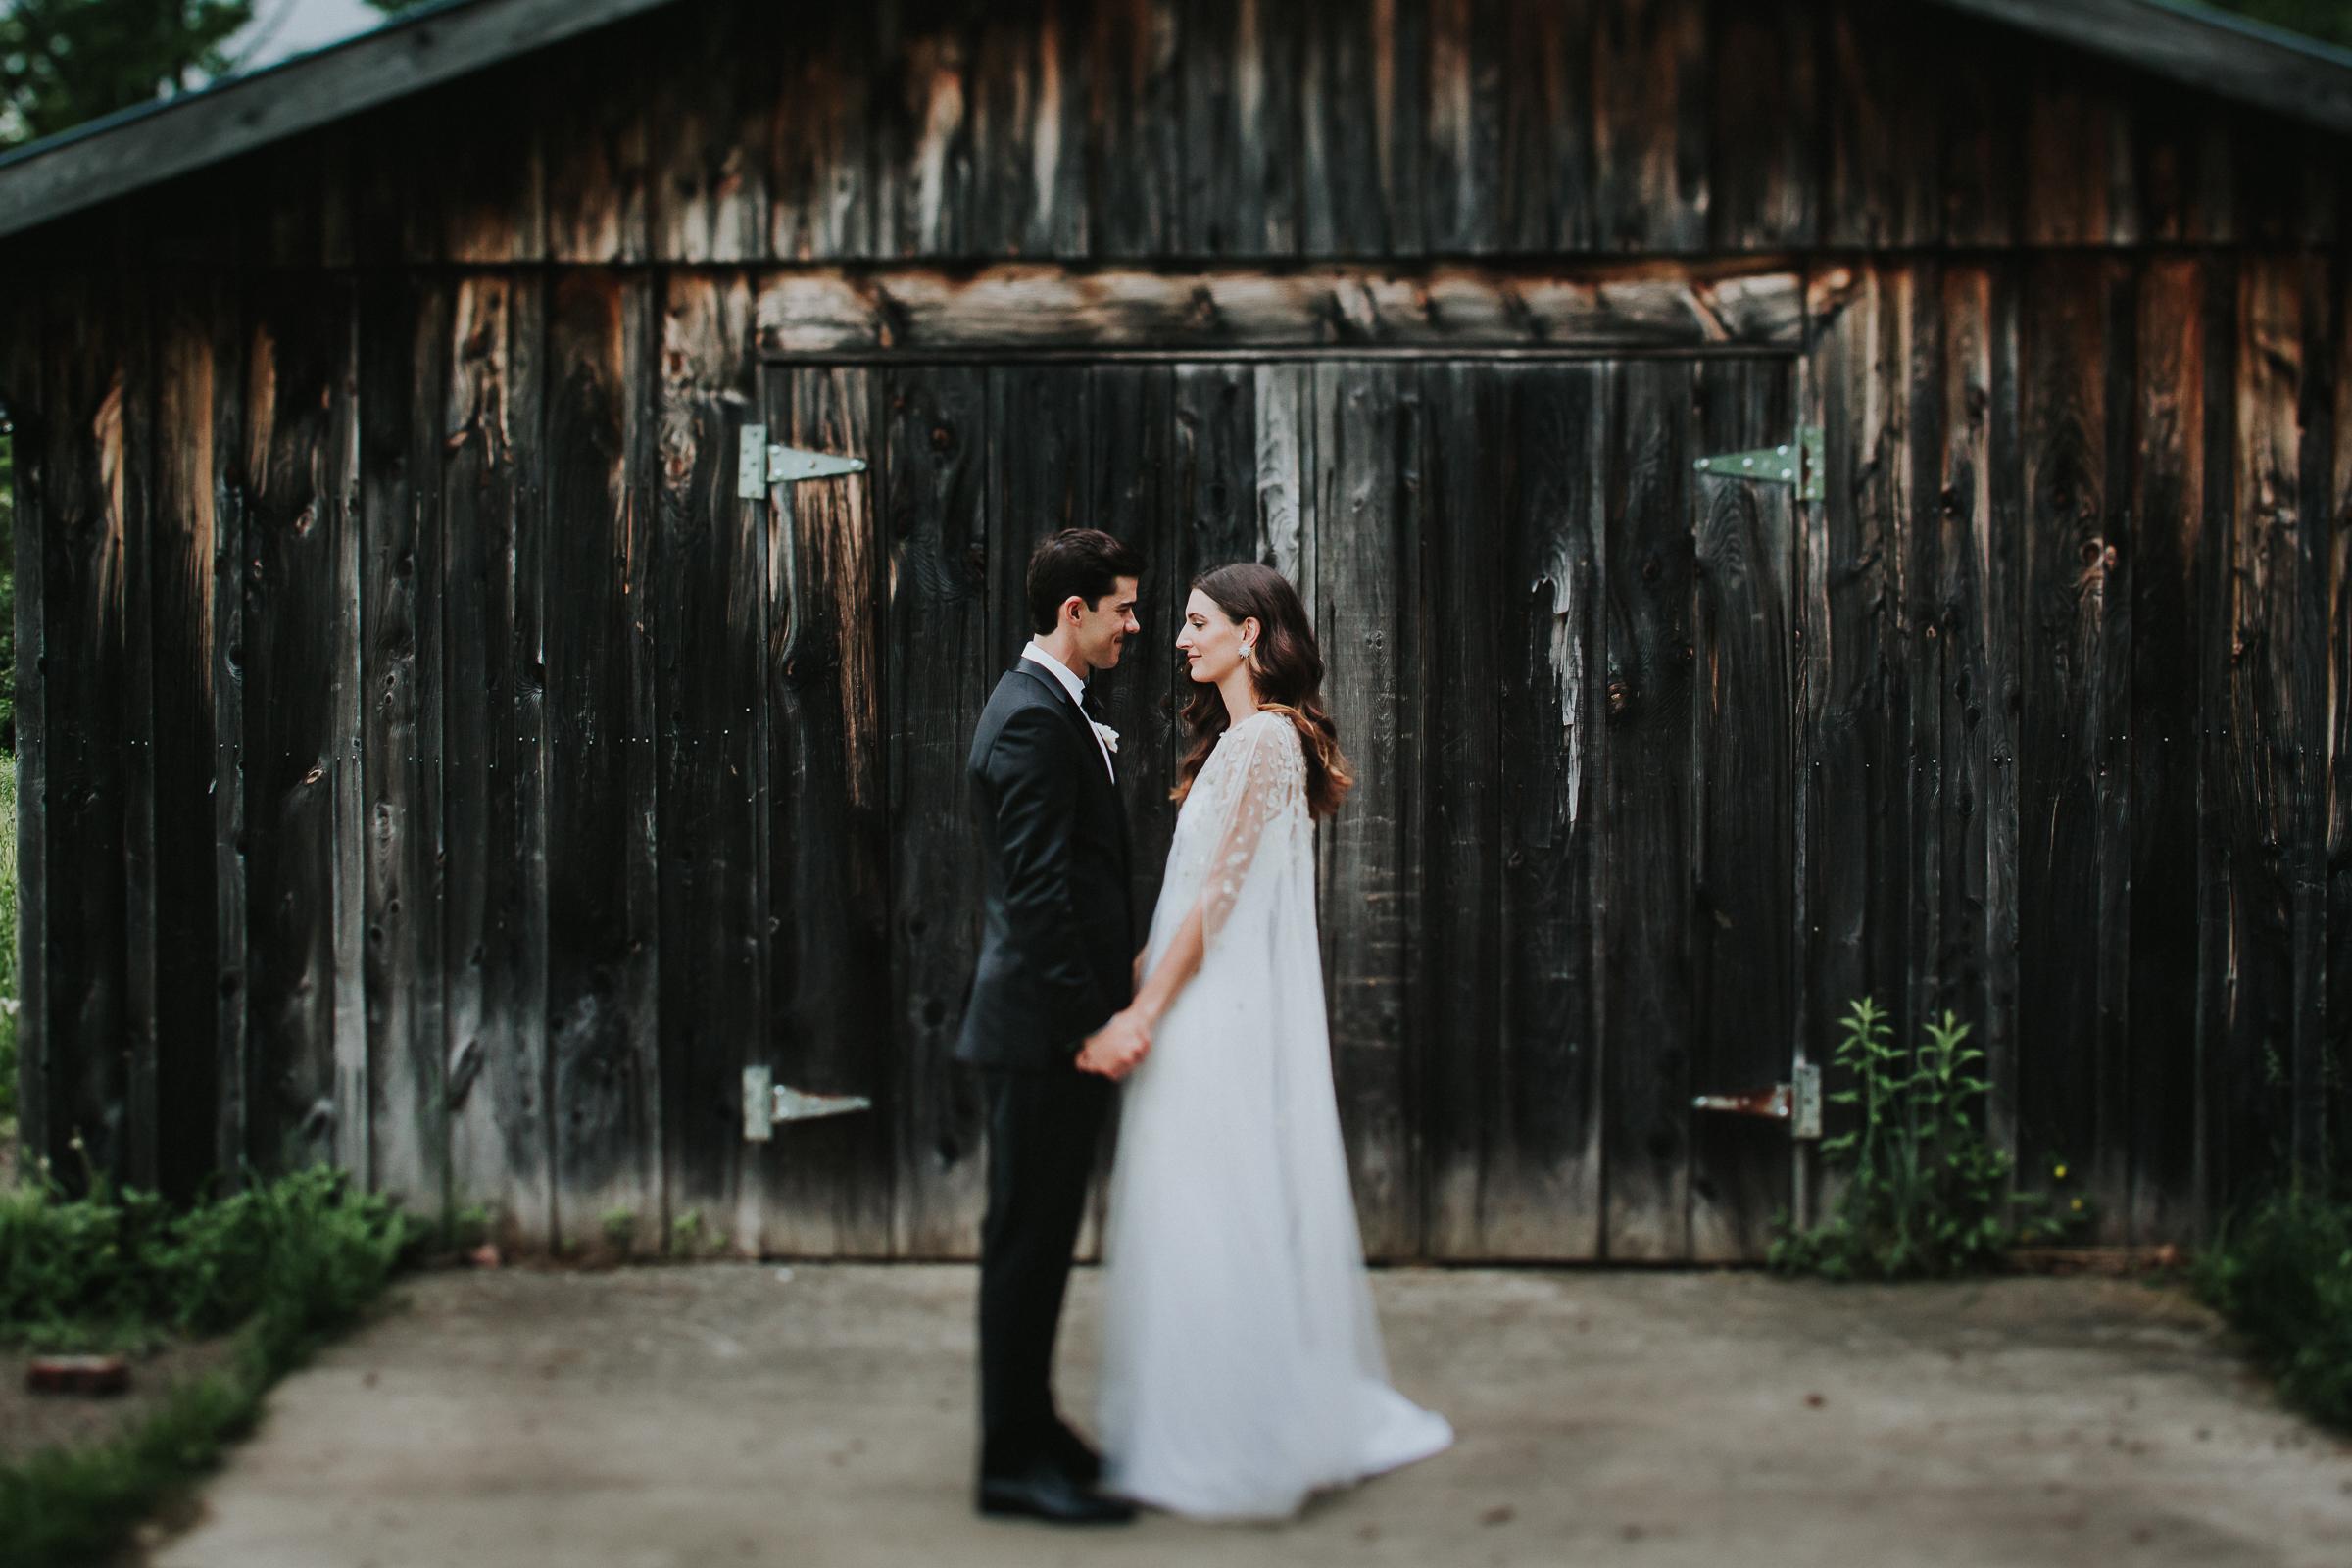 Handsome-Hollow-Long-Eddy-Catskills-New-York-Fine-Art-Documentary-Wedding-Photographer-34.jpg